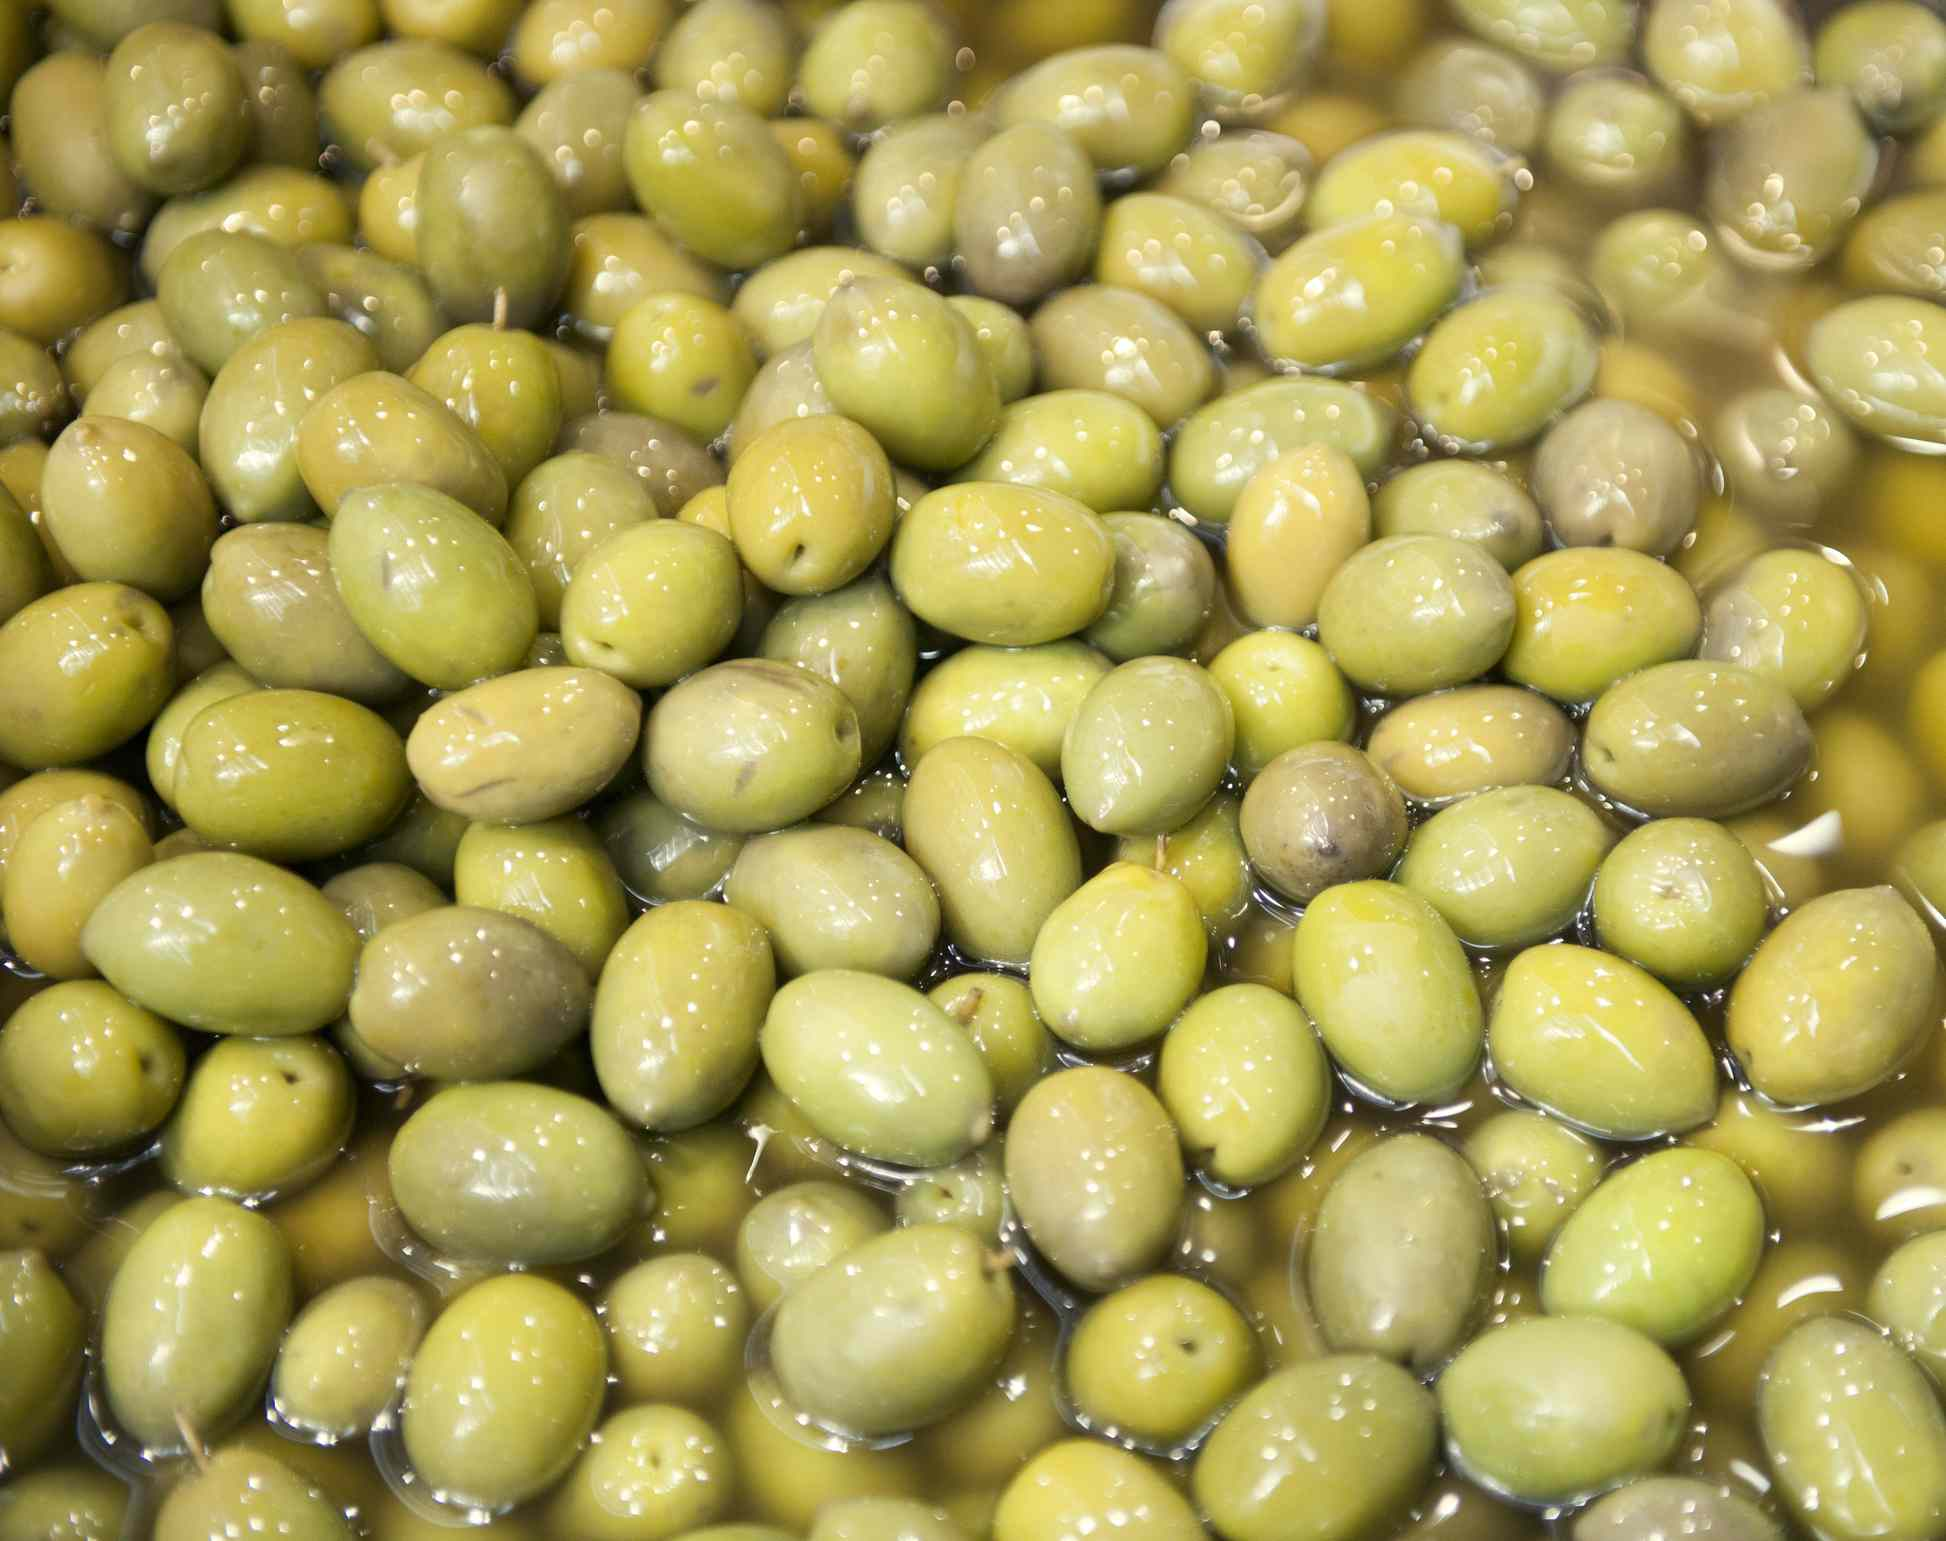 Picholine olives soaking in brine